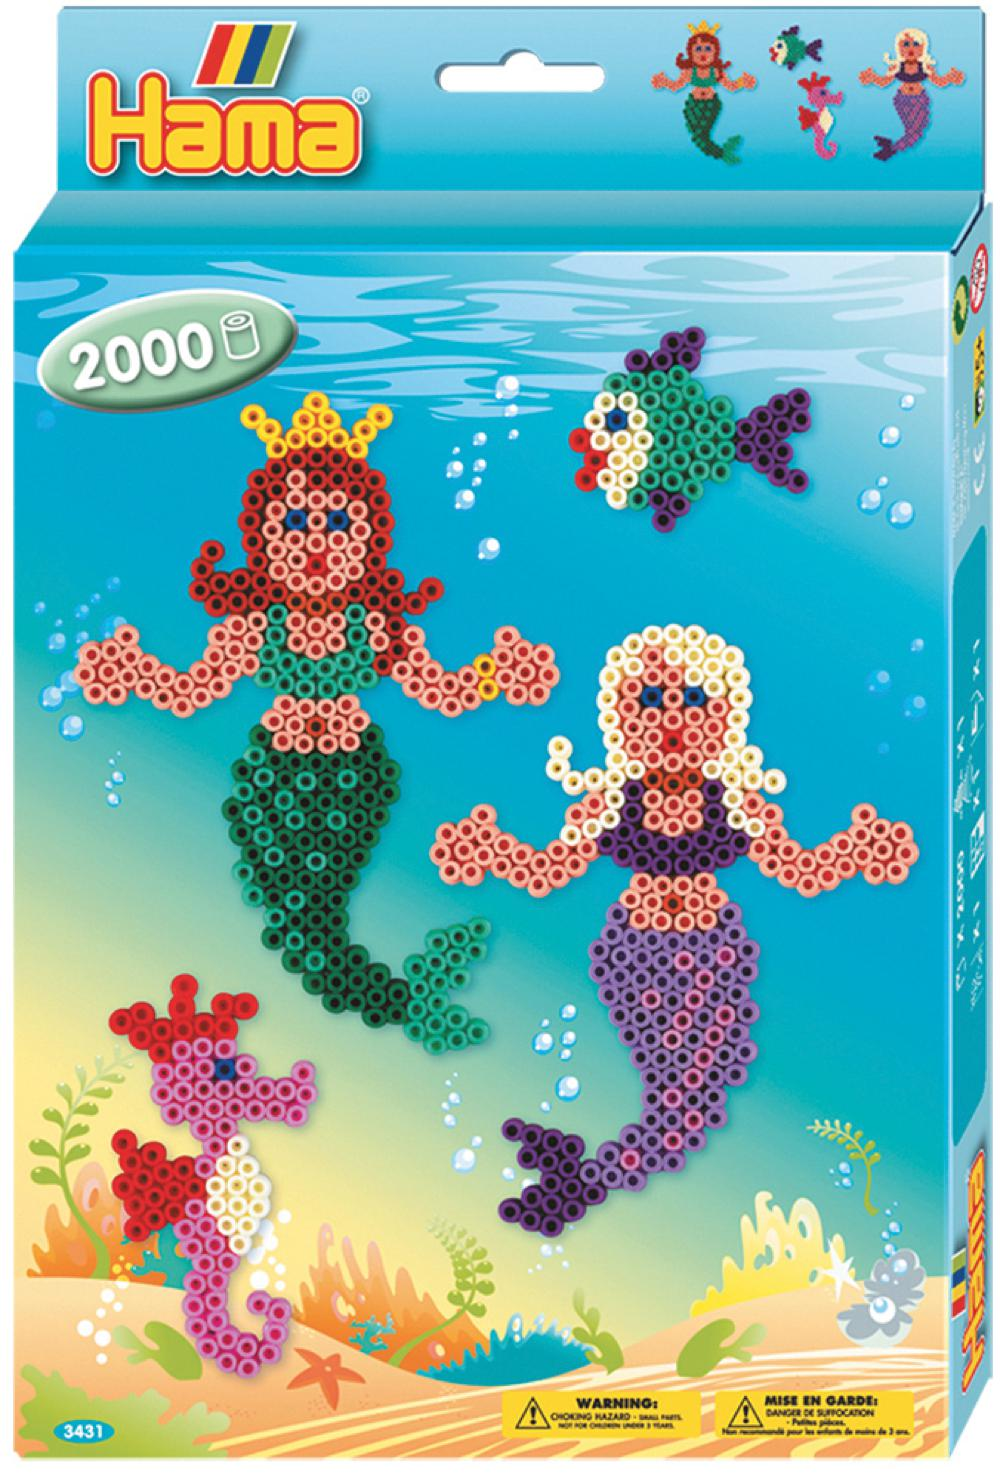 Hama - Boite 2000 perles Sirènes